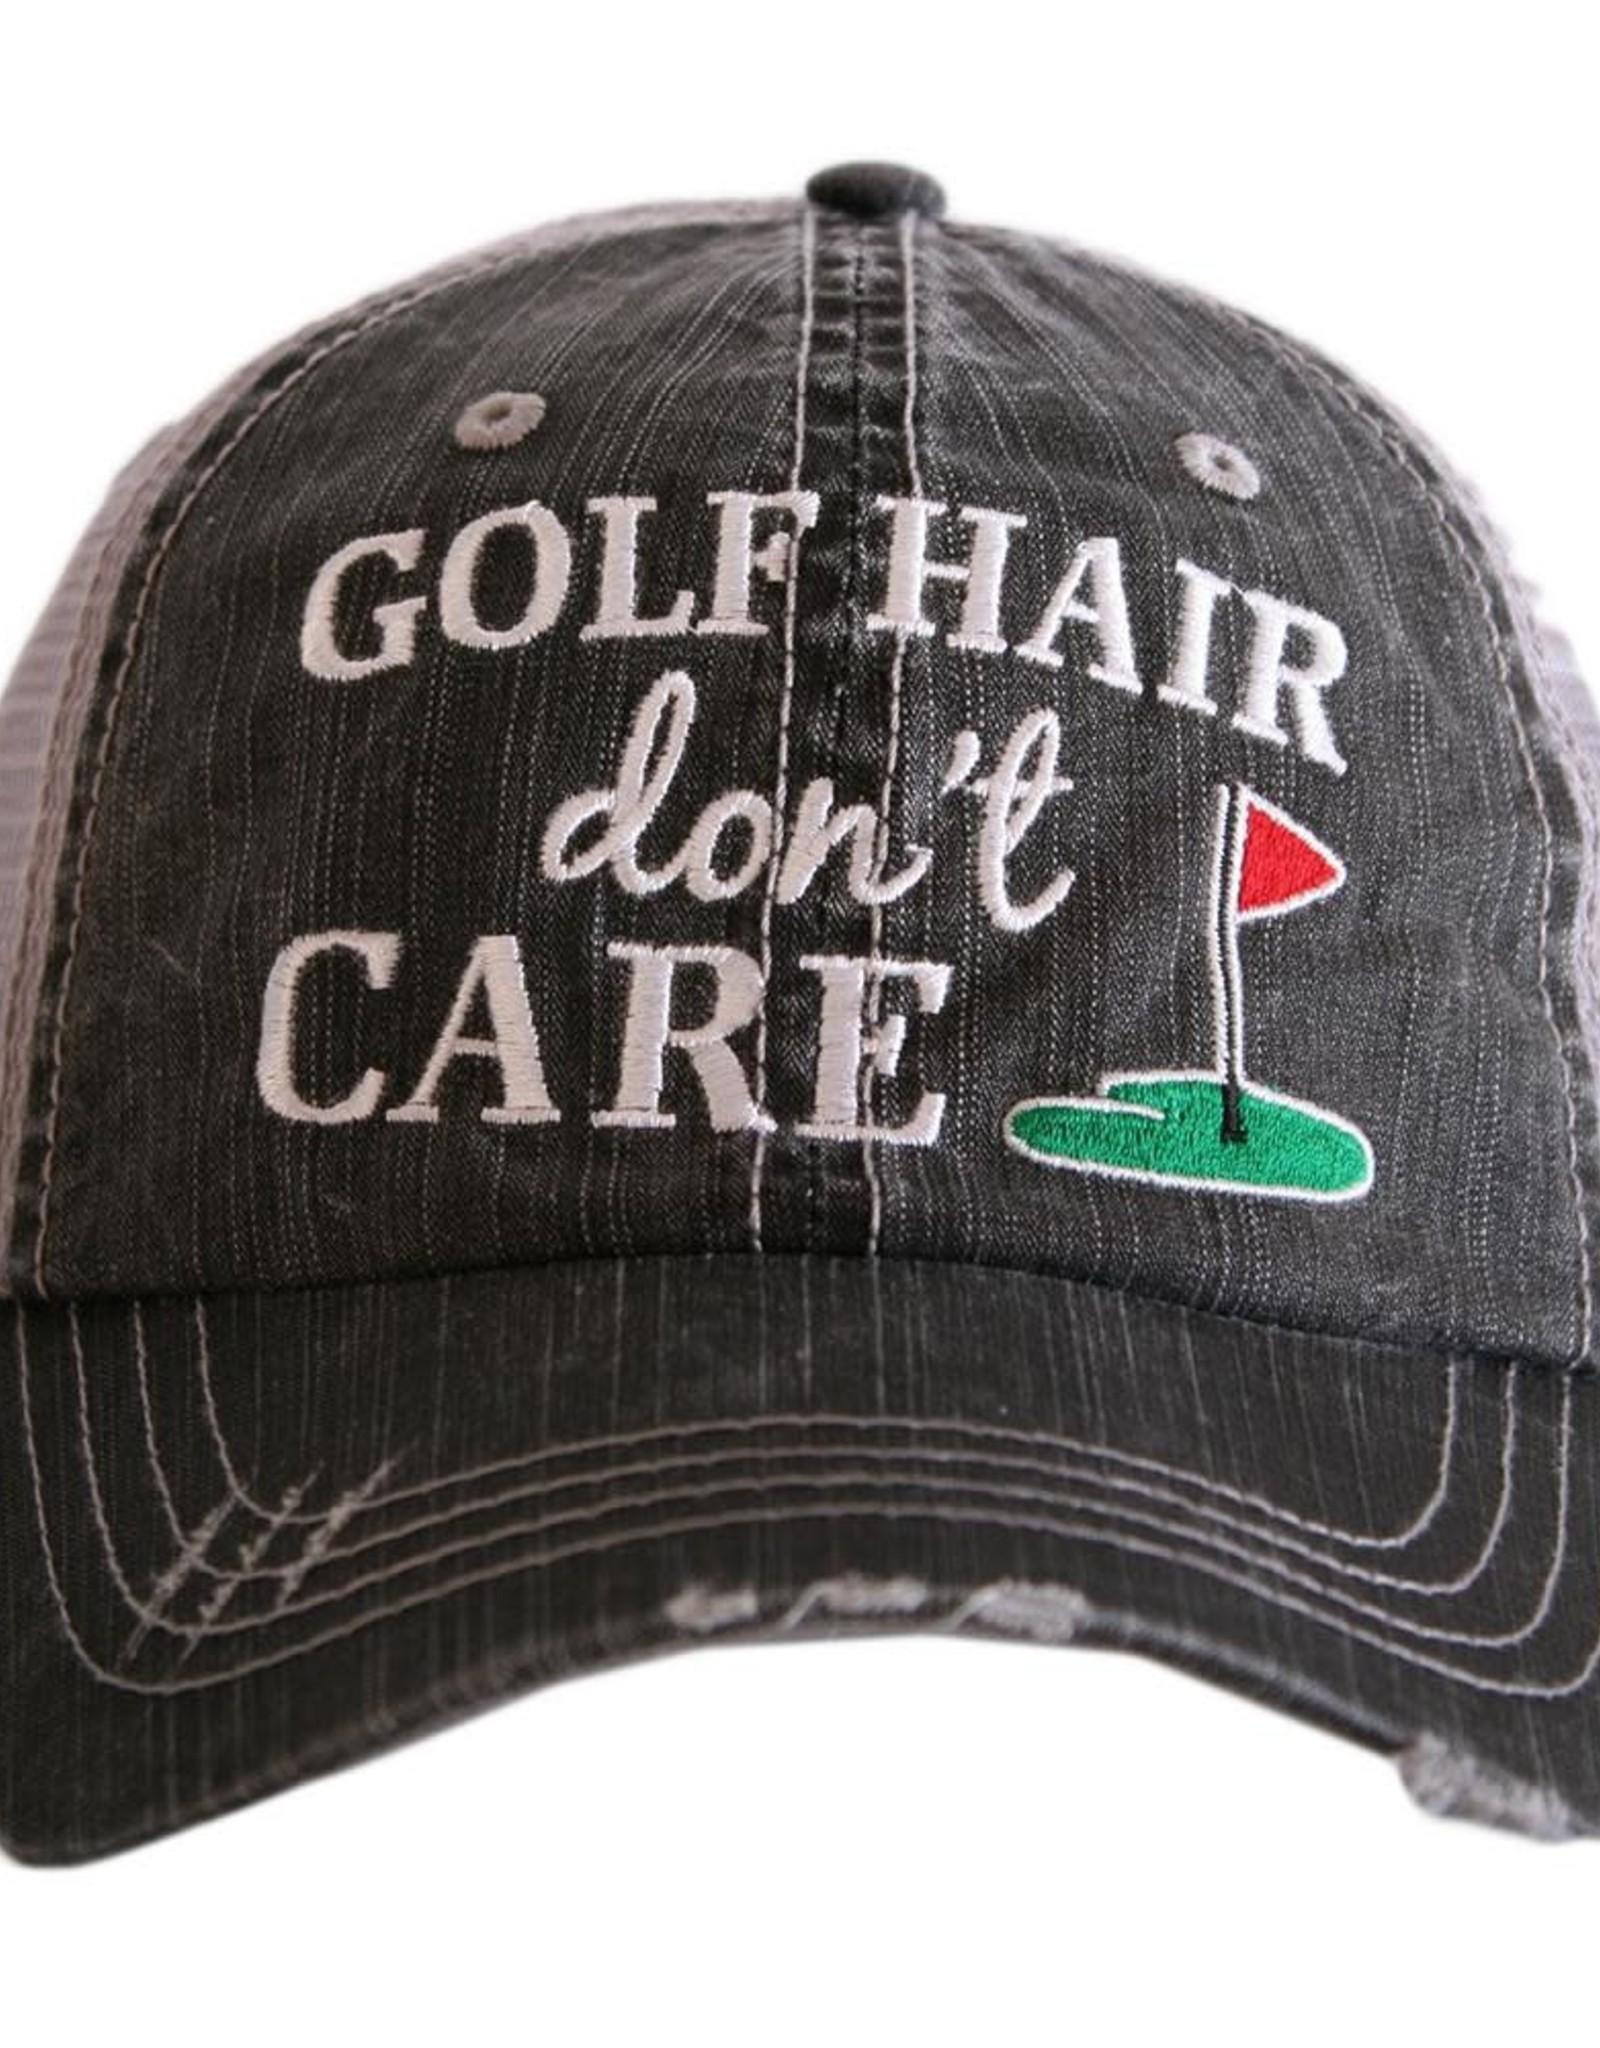 TLC golf hair trucker hat